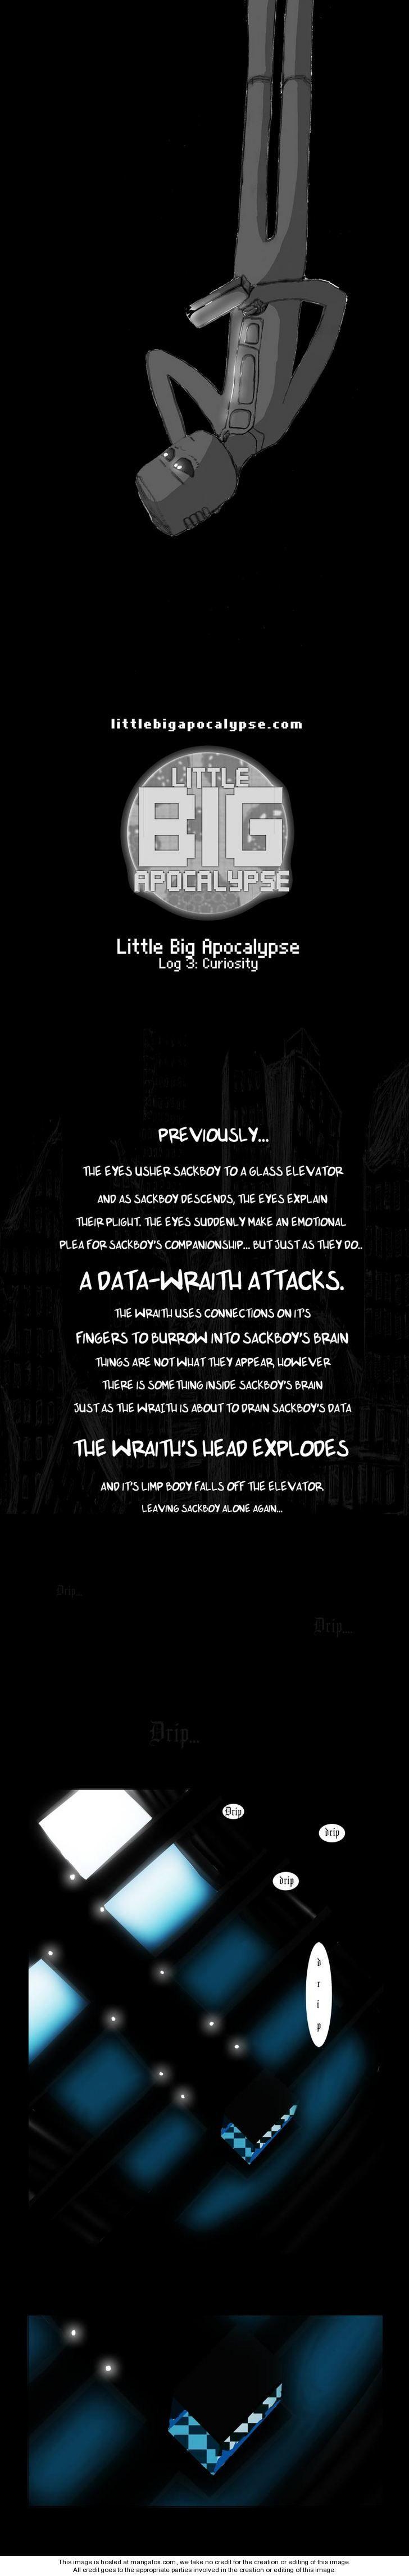 Little Big Apocalypse 3: Curiosity at MangaFox.la